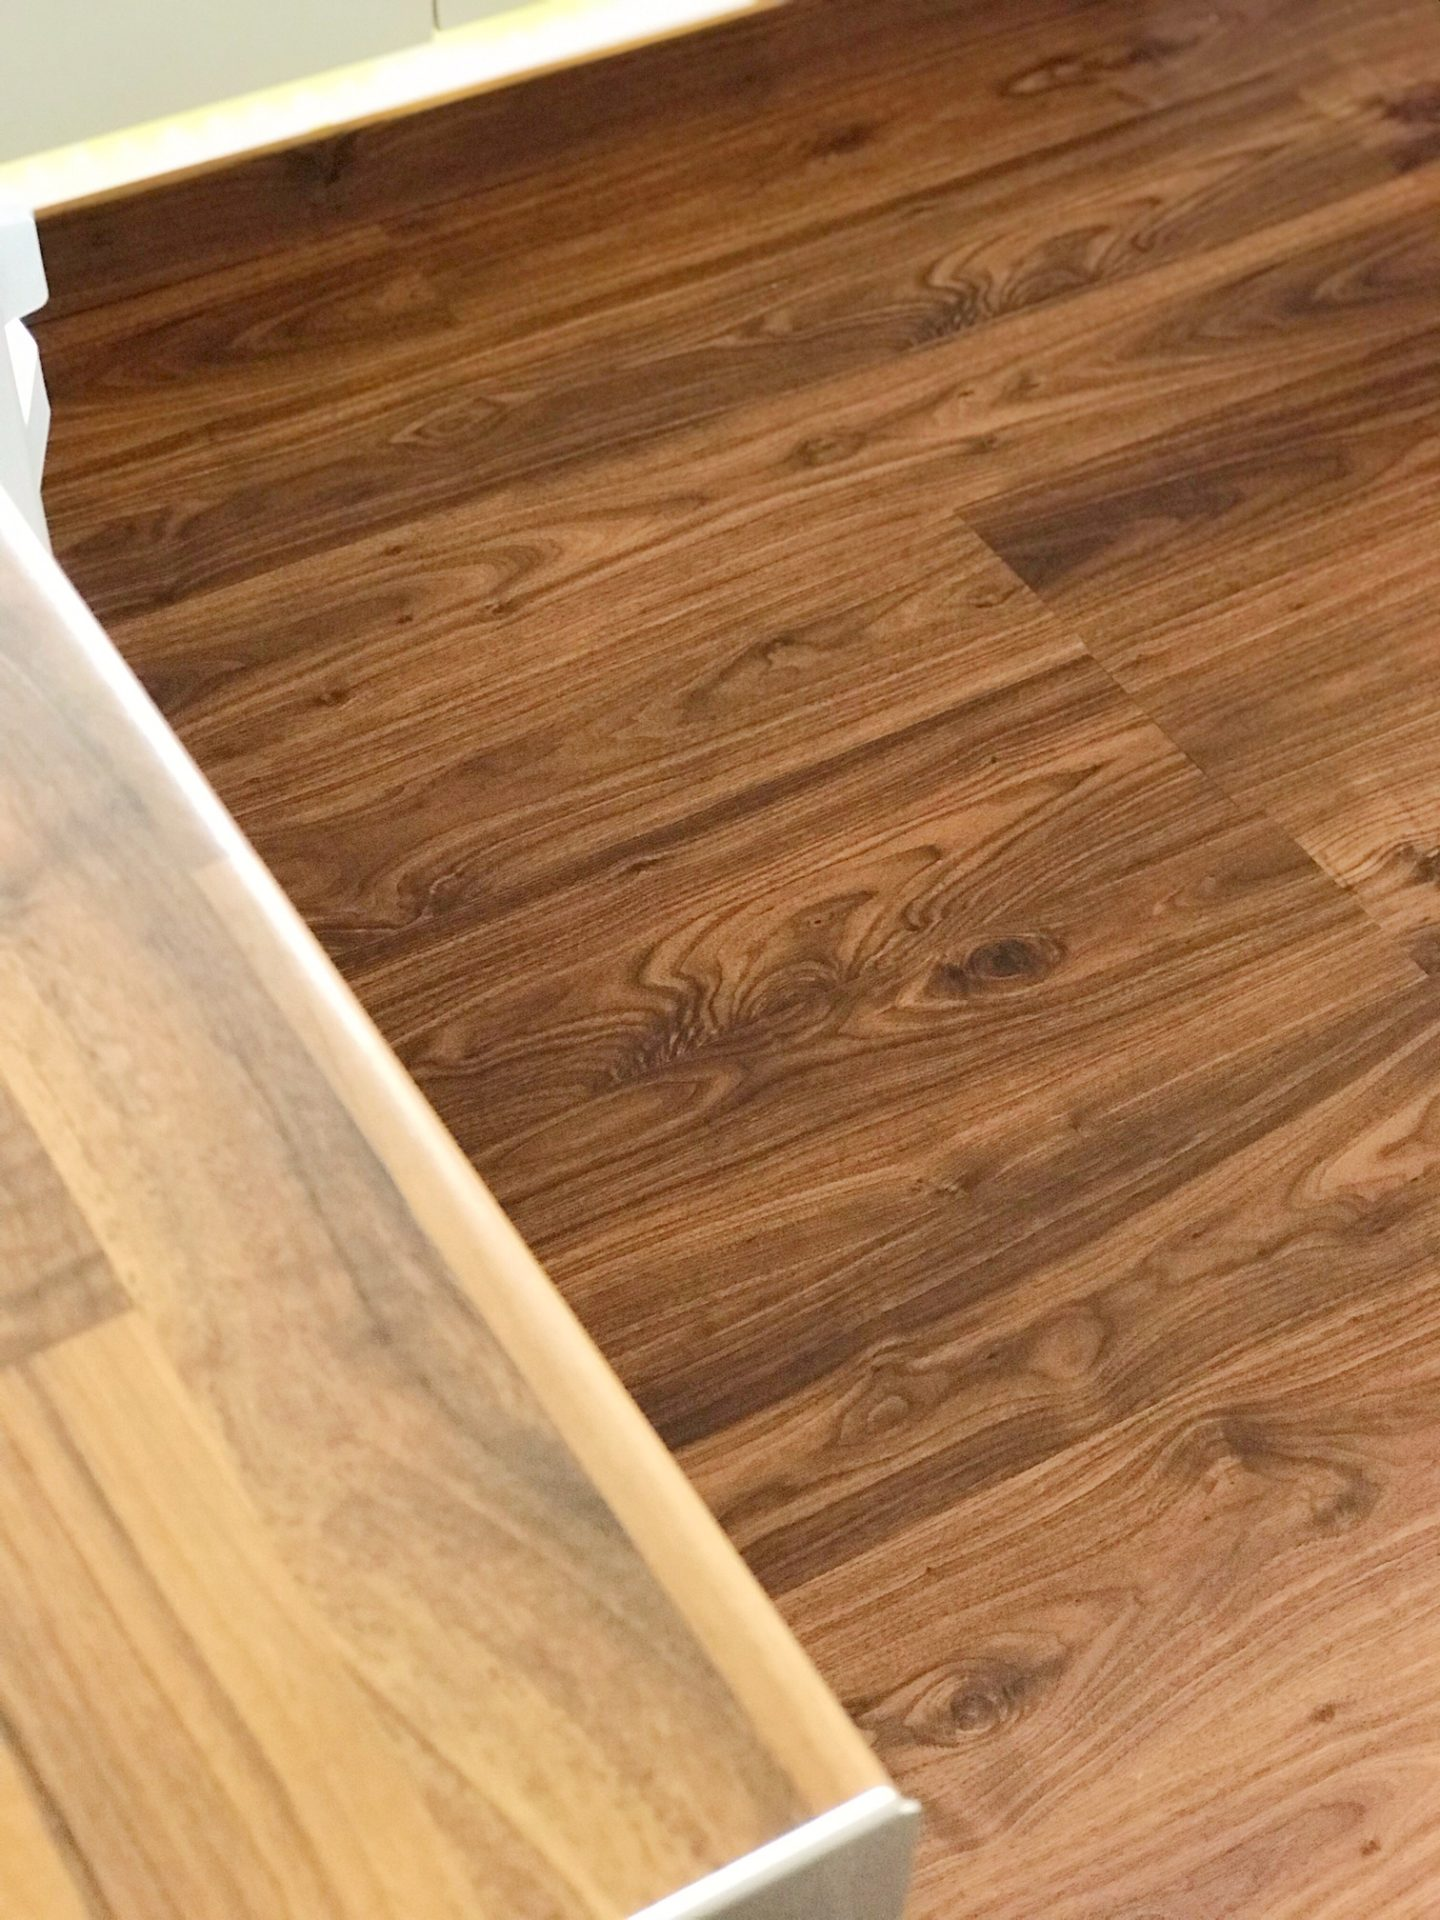 wooden-worktops-and-flooring-kitchen-ideas-home-decor